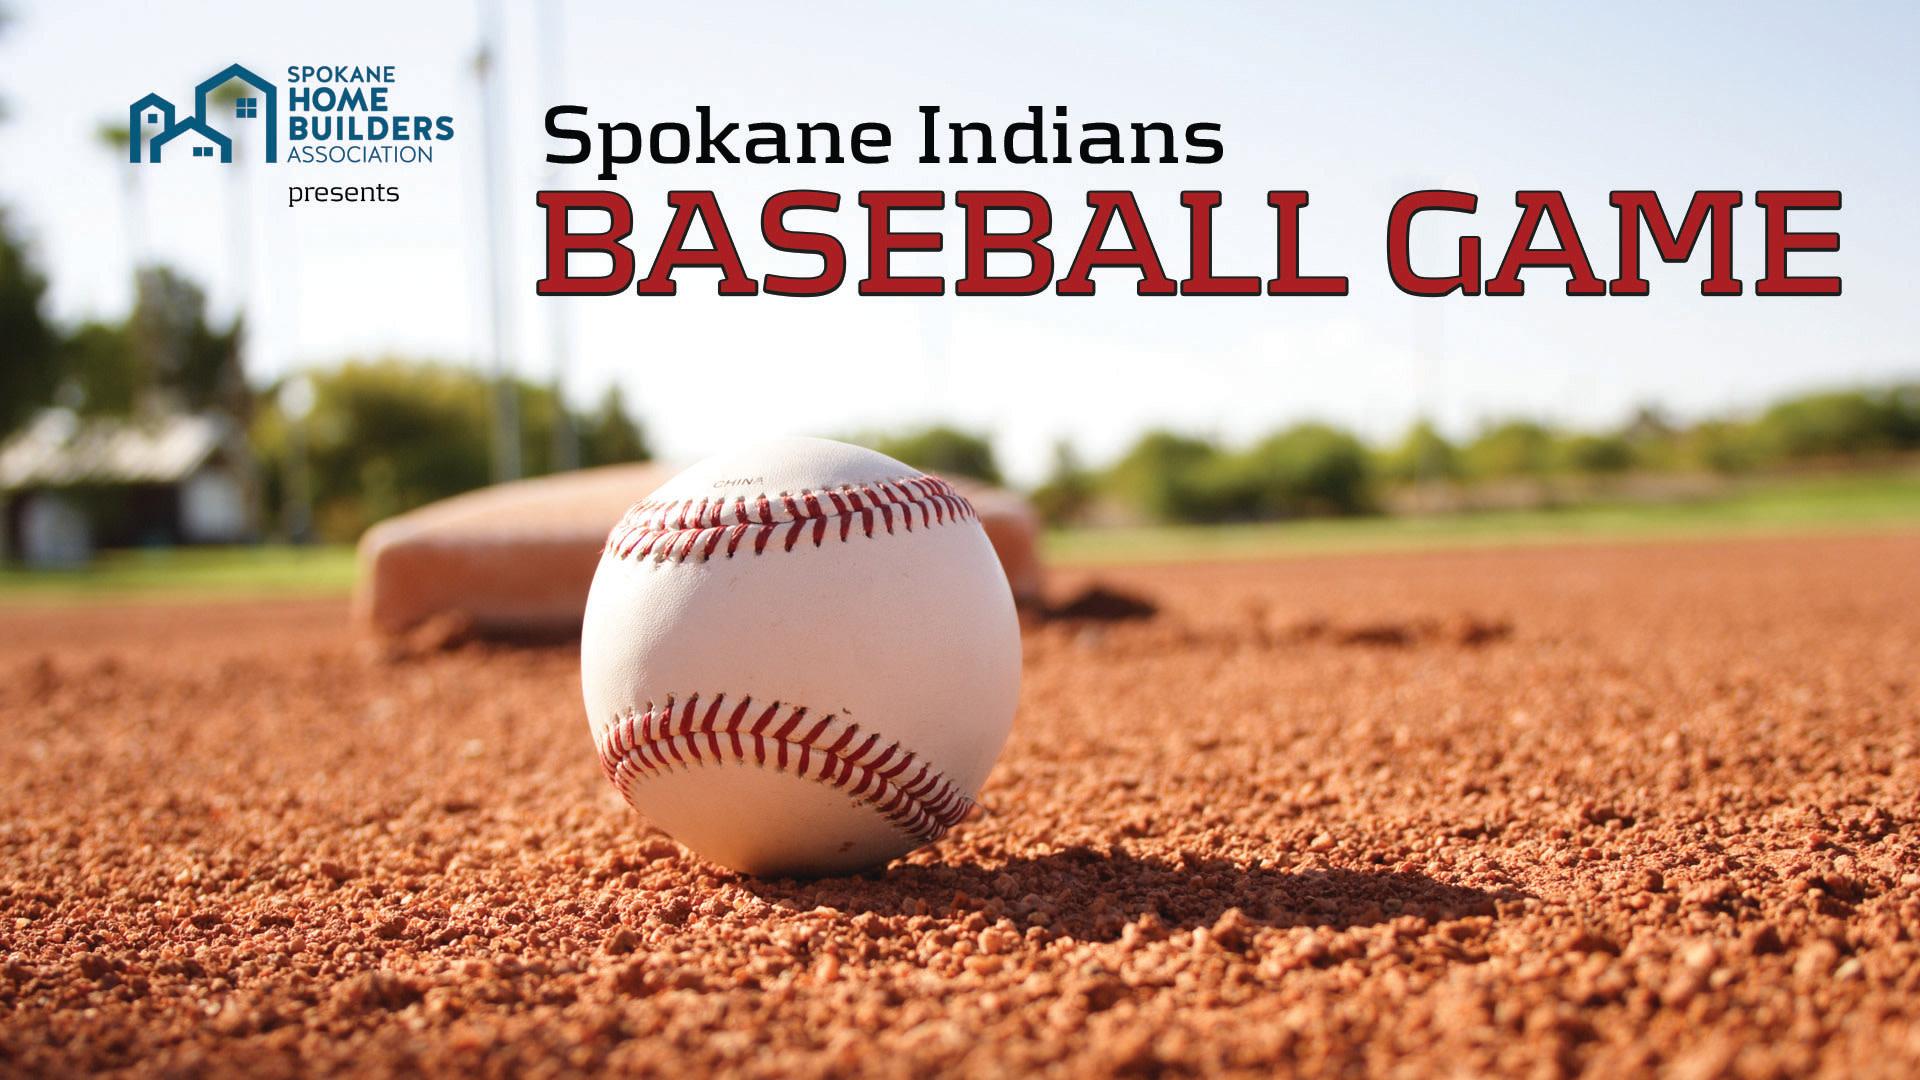 Spokane Indians Baseball Game